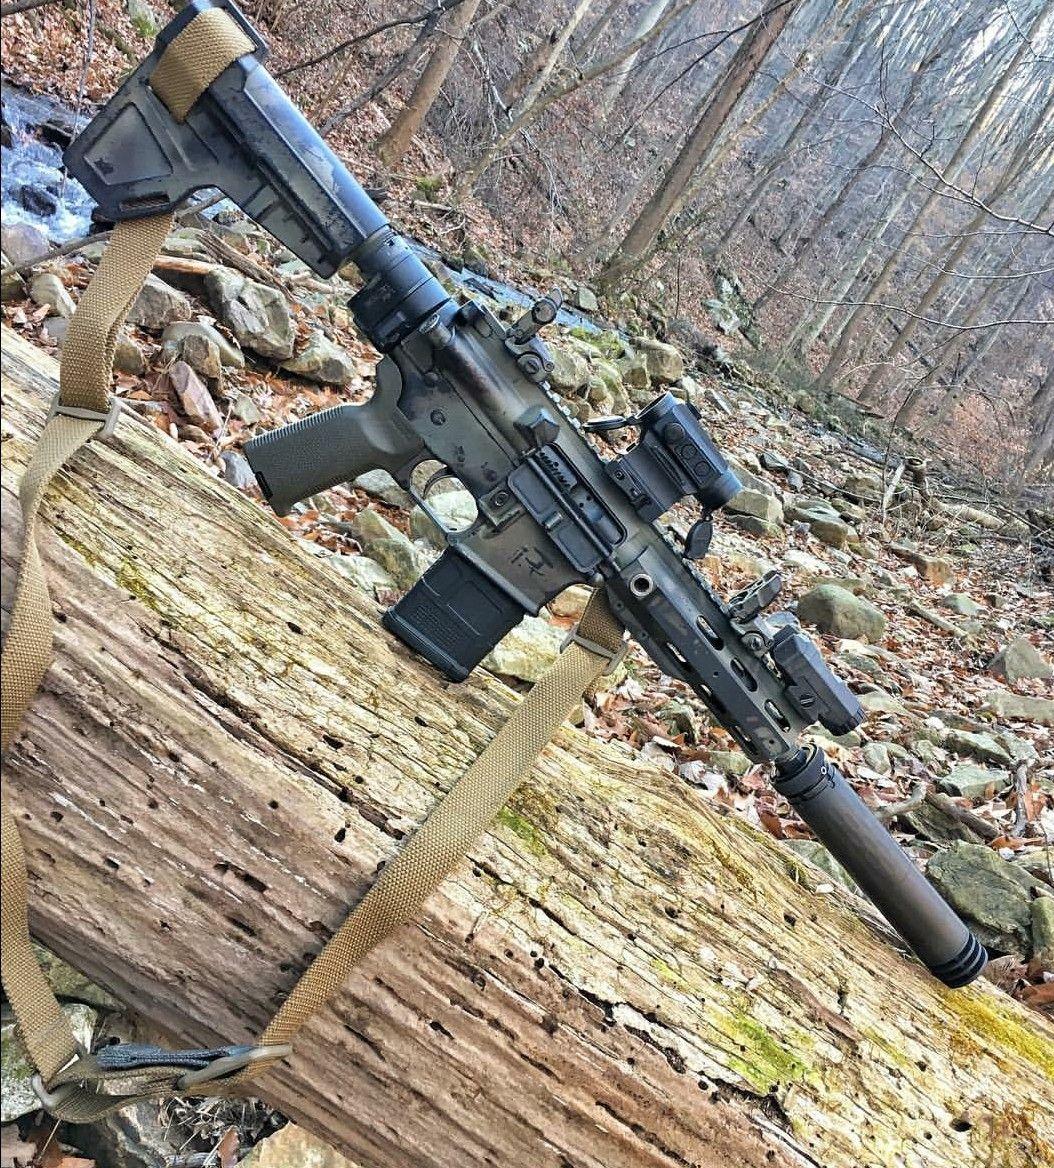 Pin de John Vintigni en Firearms | Pinterest | Armas